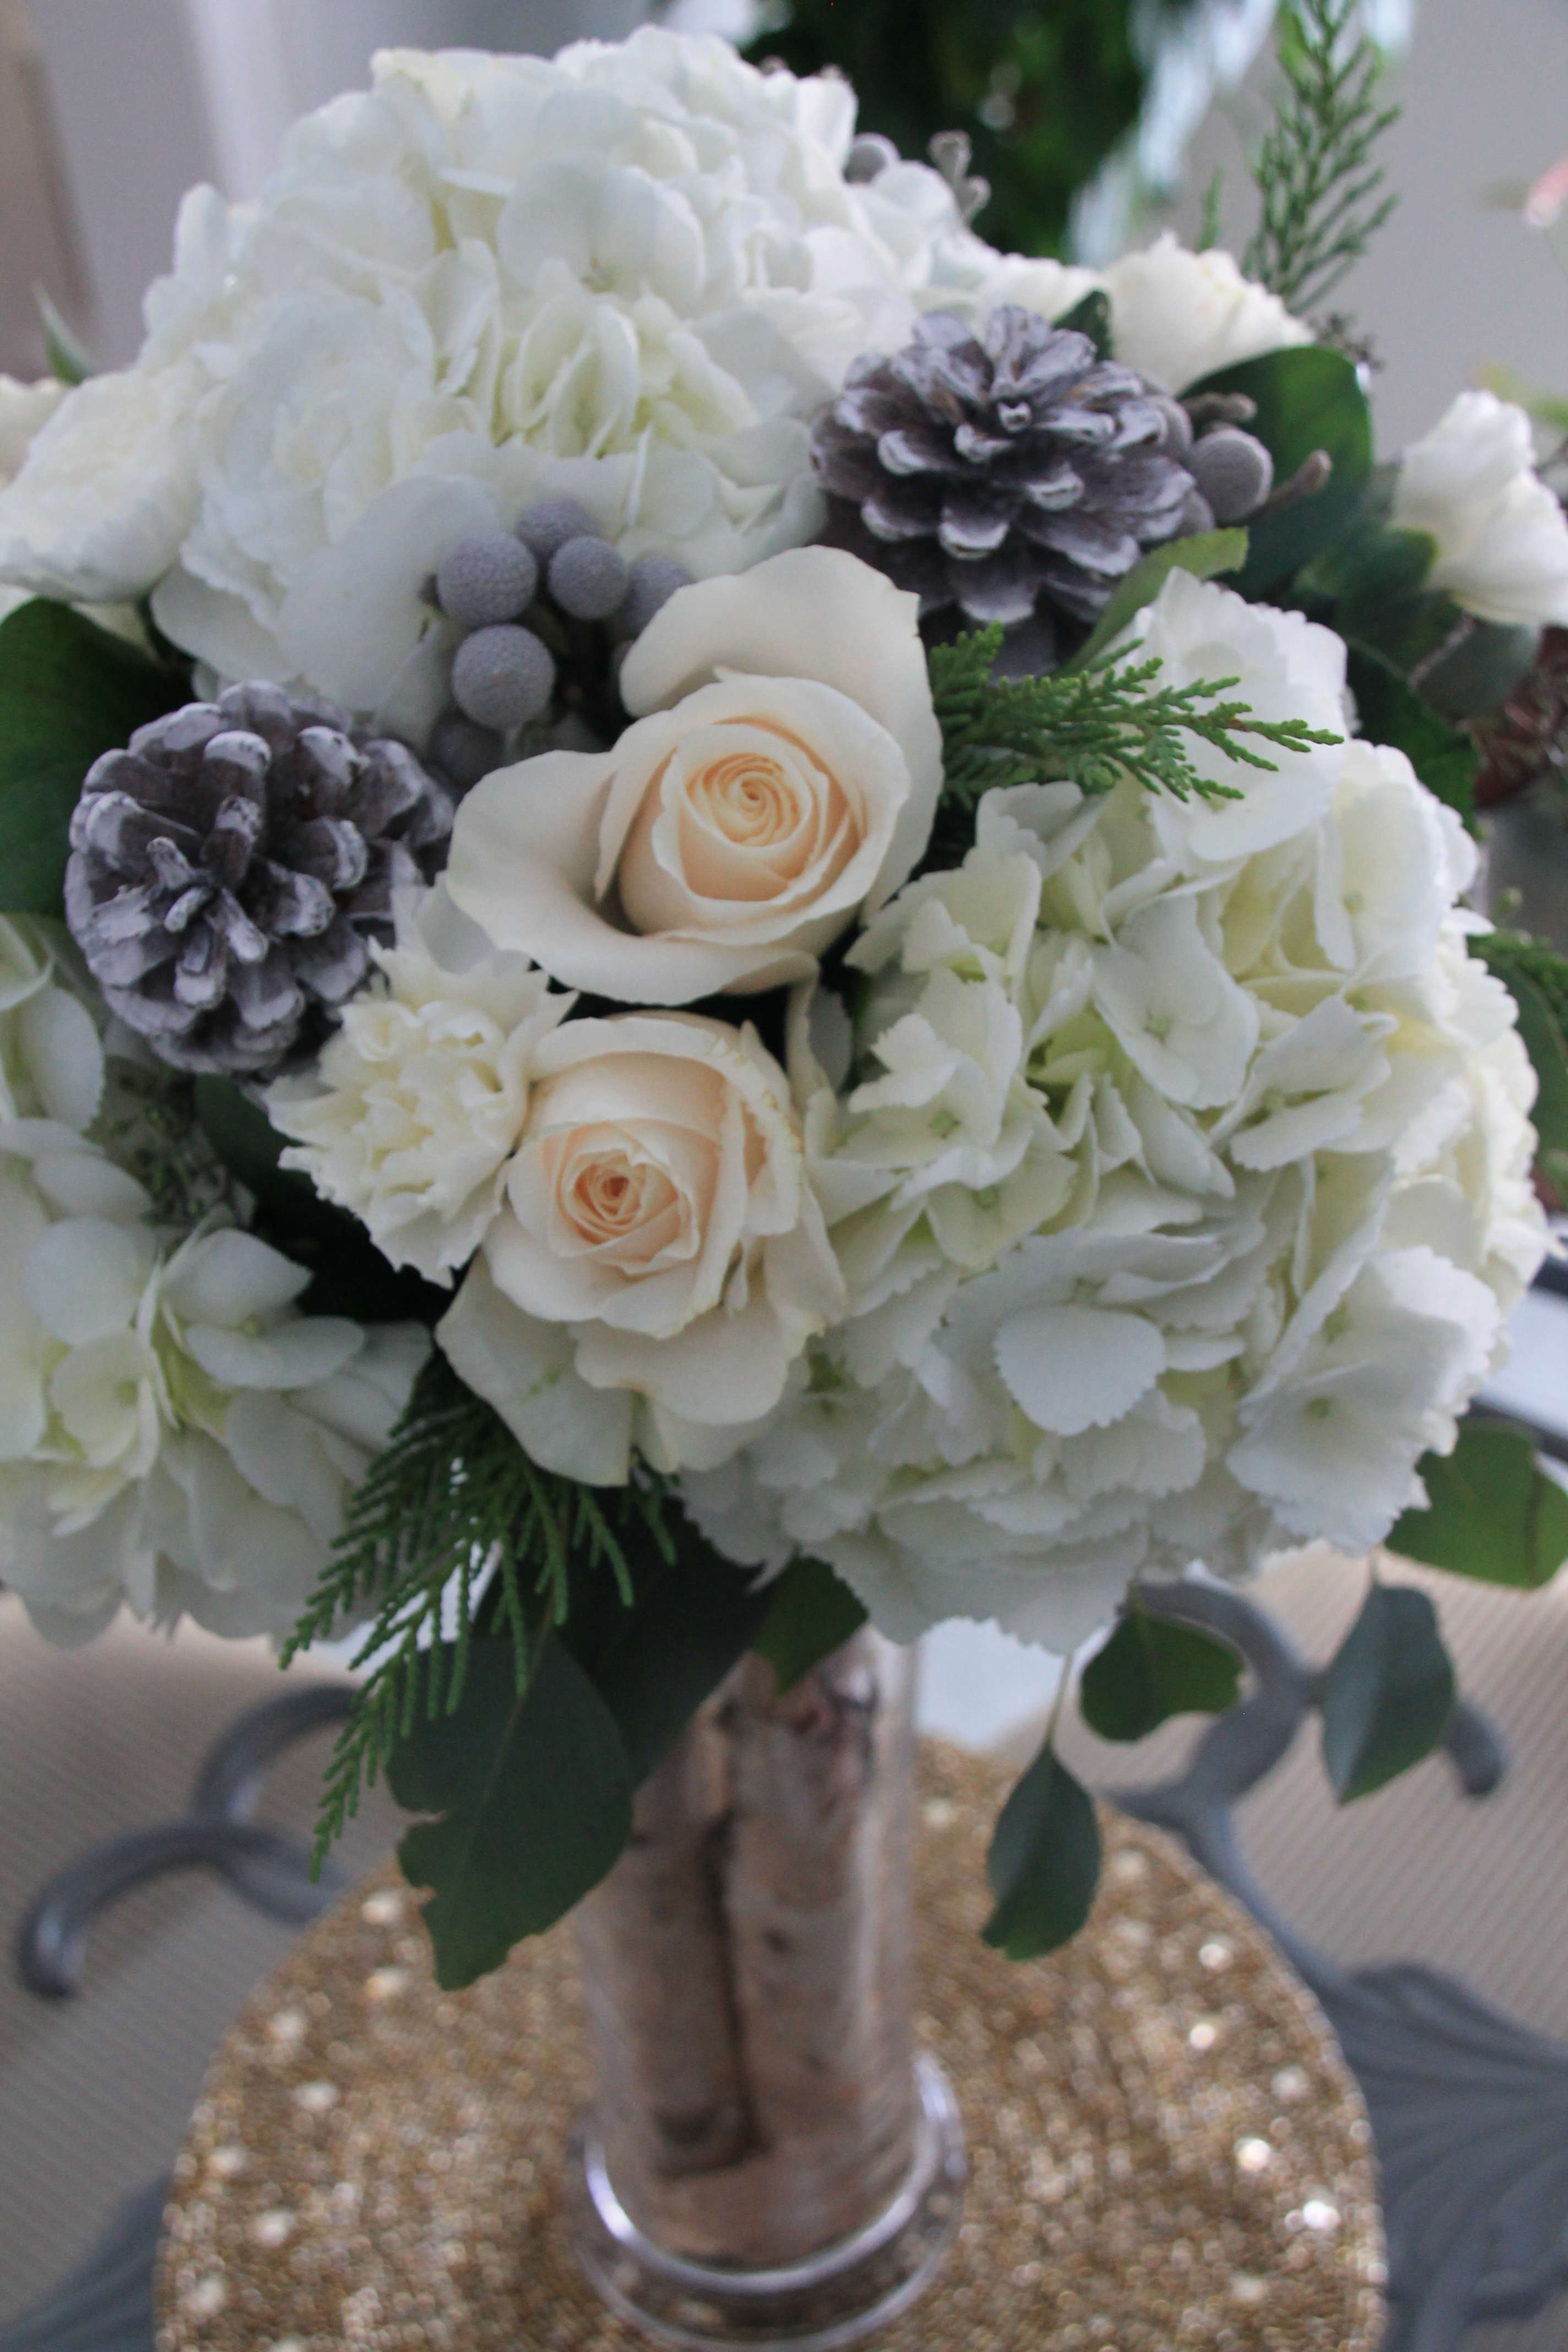 Winter flower arrangements elegant bouquets some of our winter flower arrangements mightylinksfo